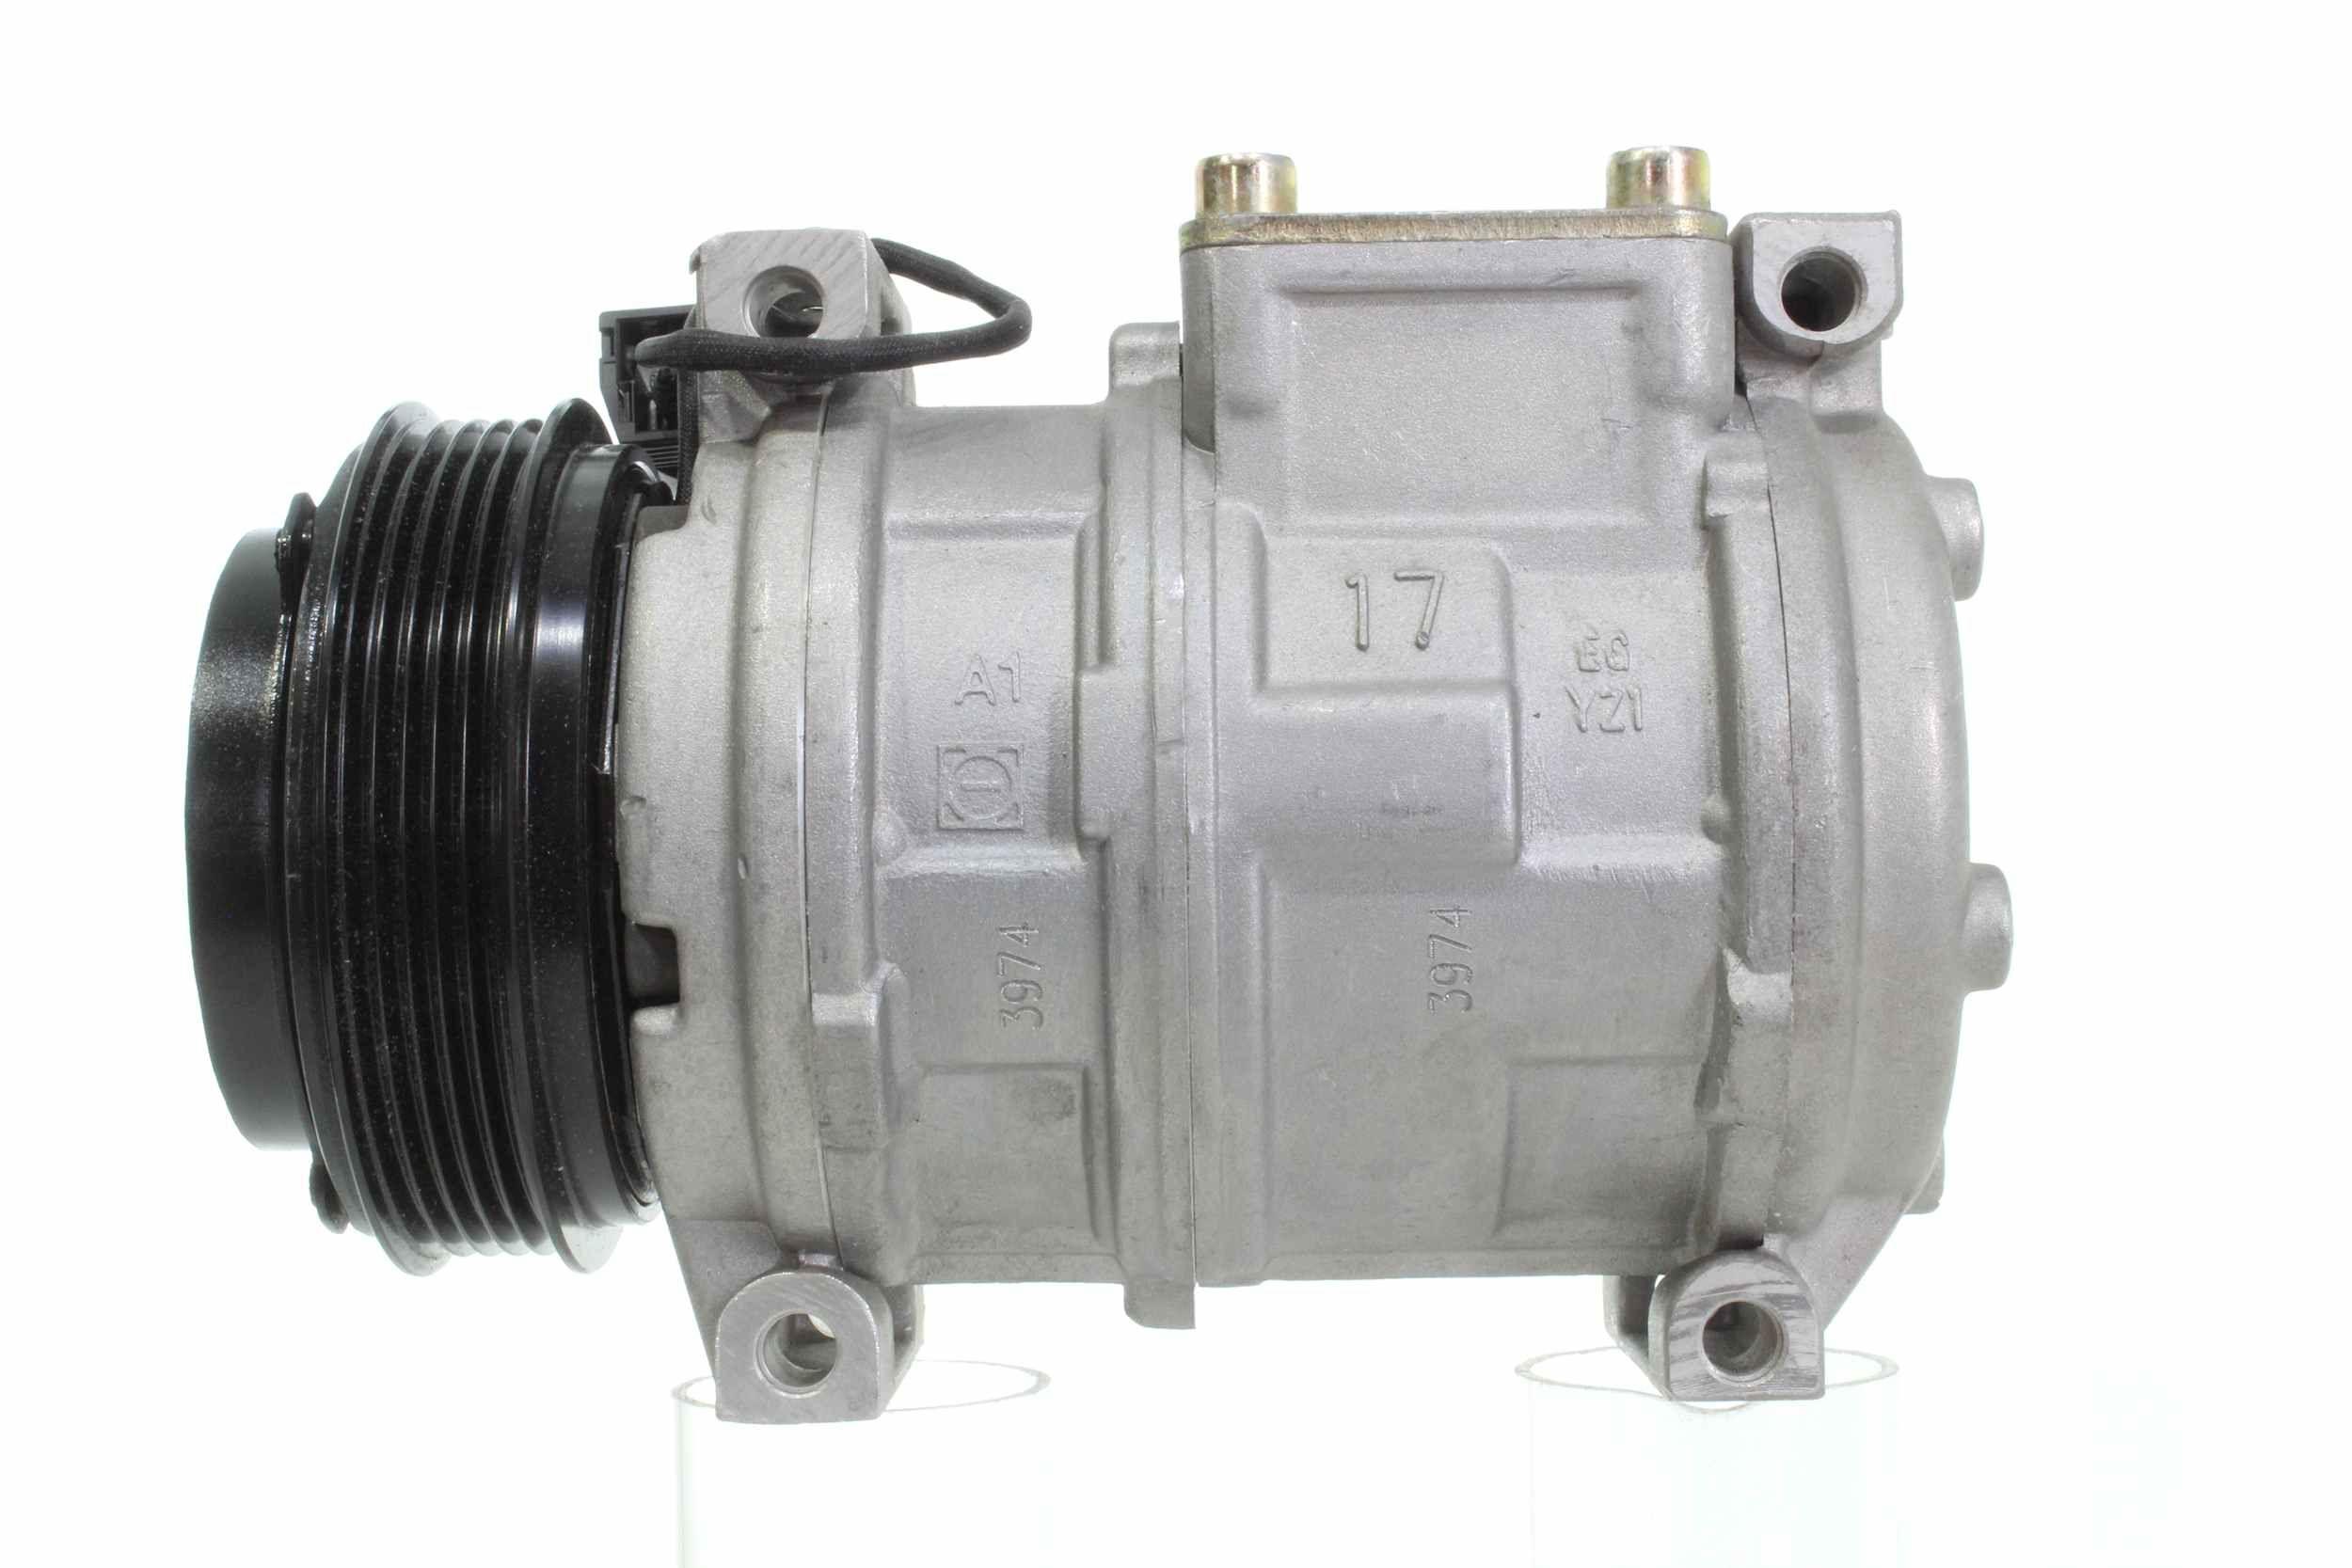 Kompressor BMW E34 Touring 1993 - ALANKO 10550121 (Riemenscheiben-Ø: 110mm)